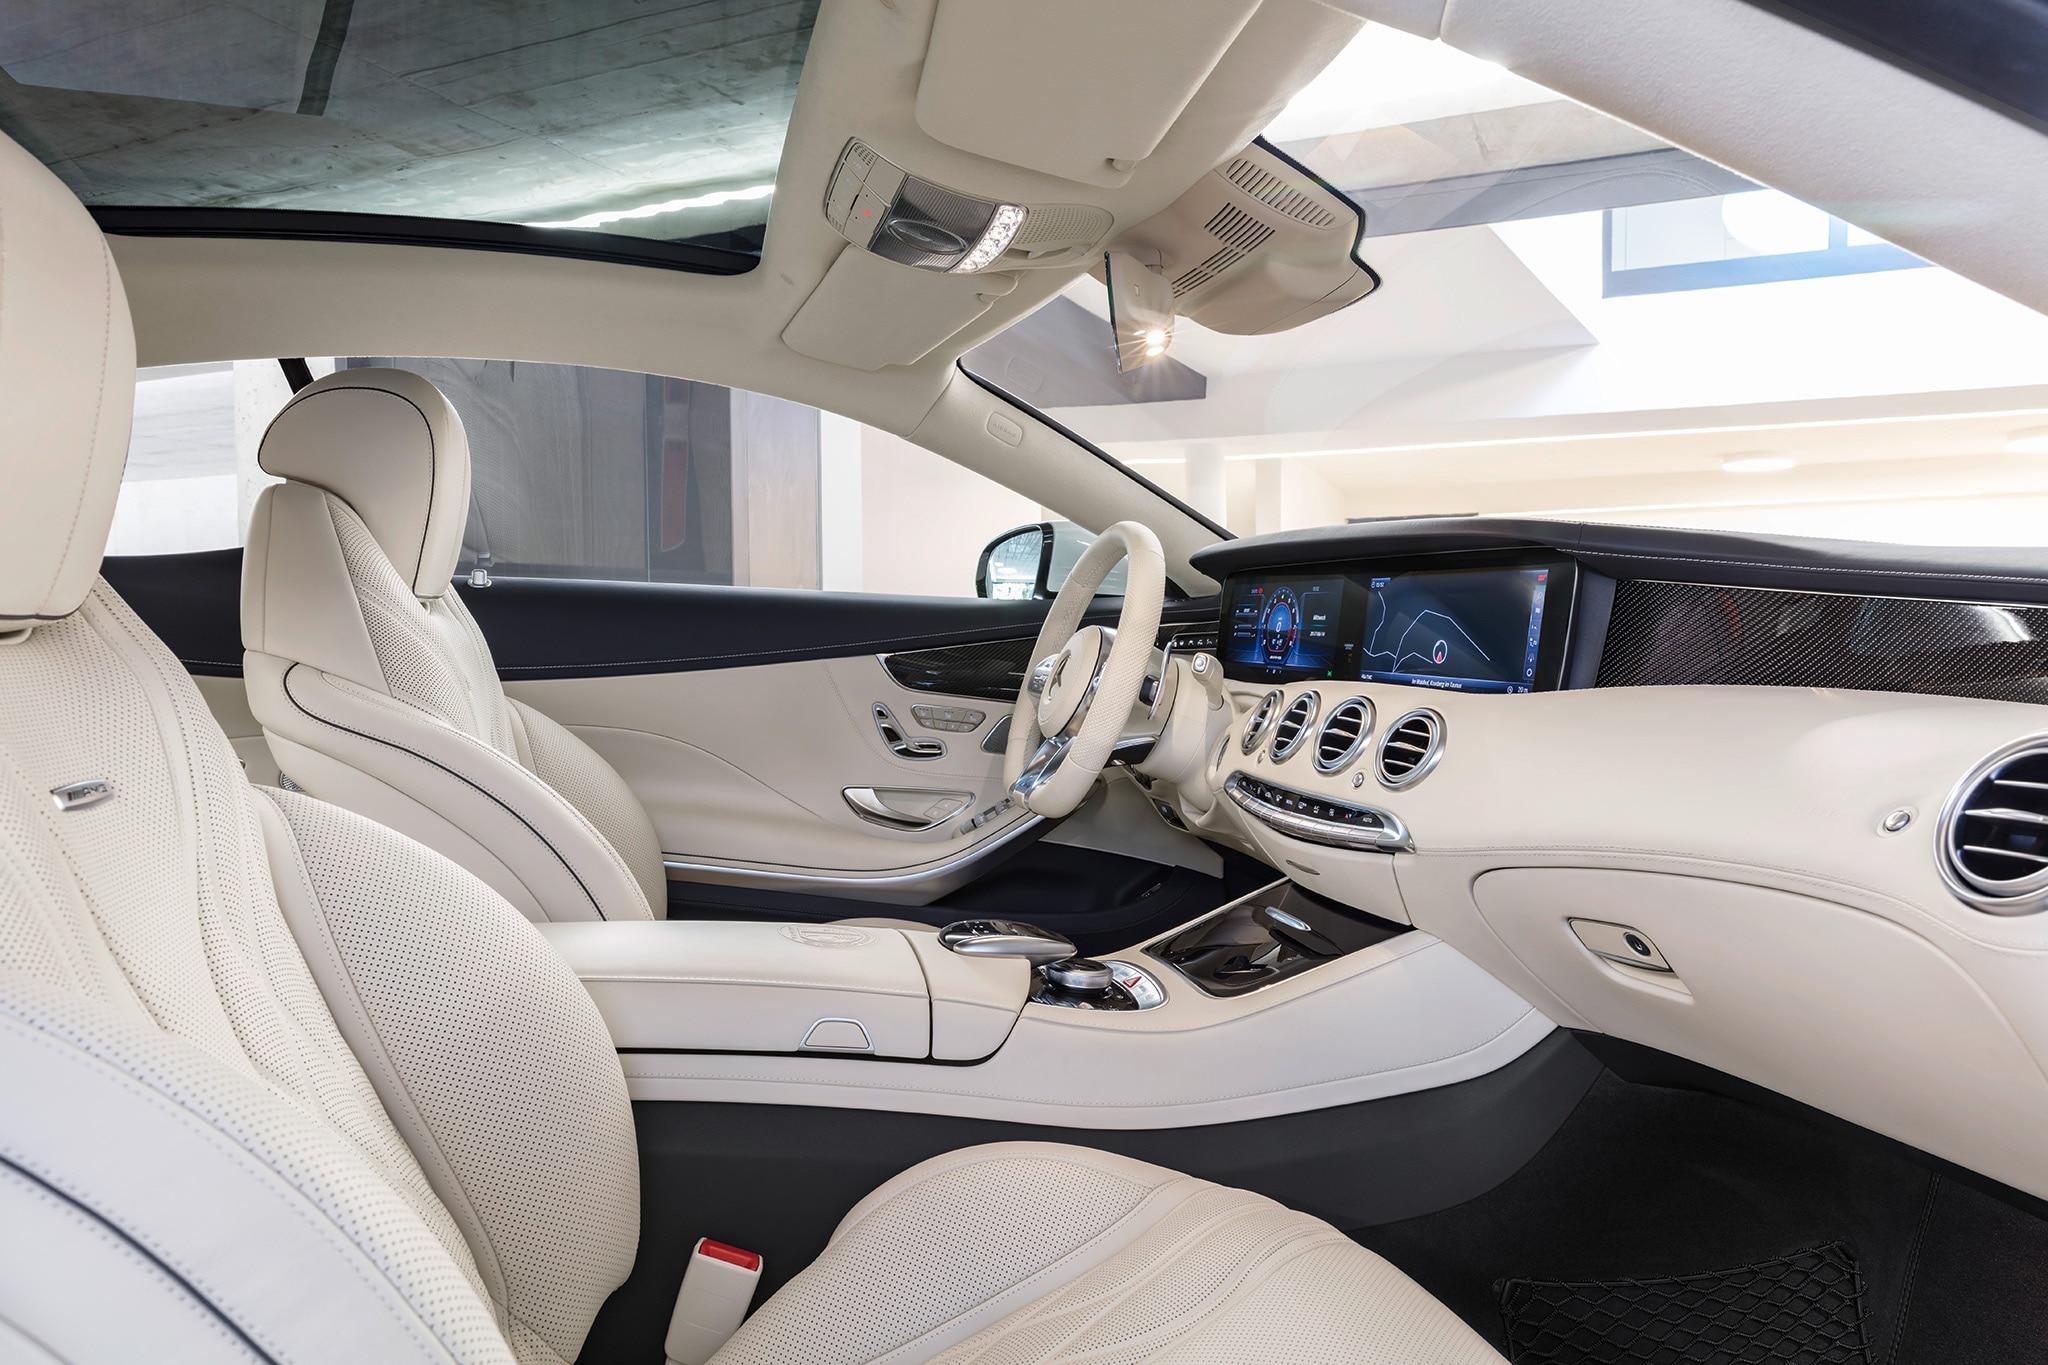 https://st.automobilemag.com/uploads/sites/11/2017/09/2018-Mercedes-AMG-S63-Coupe-01.jpg